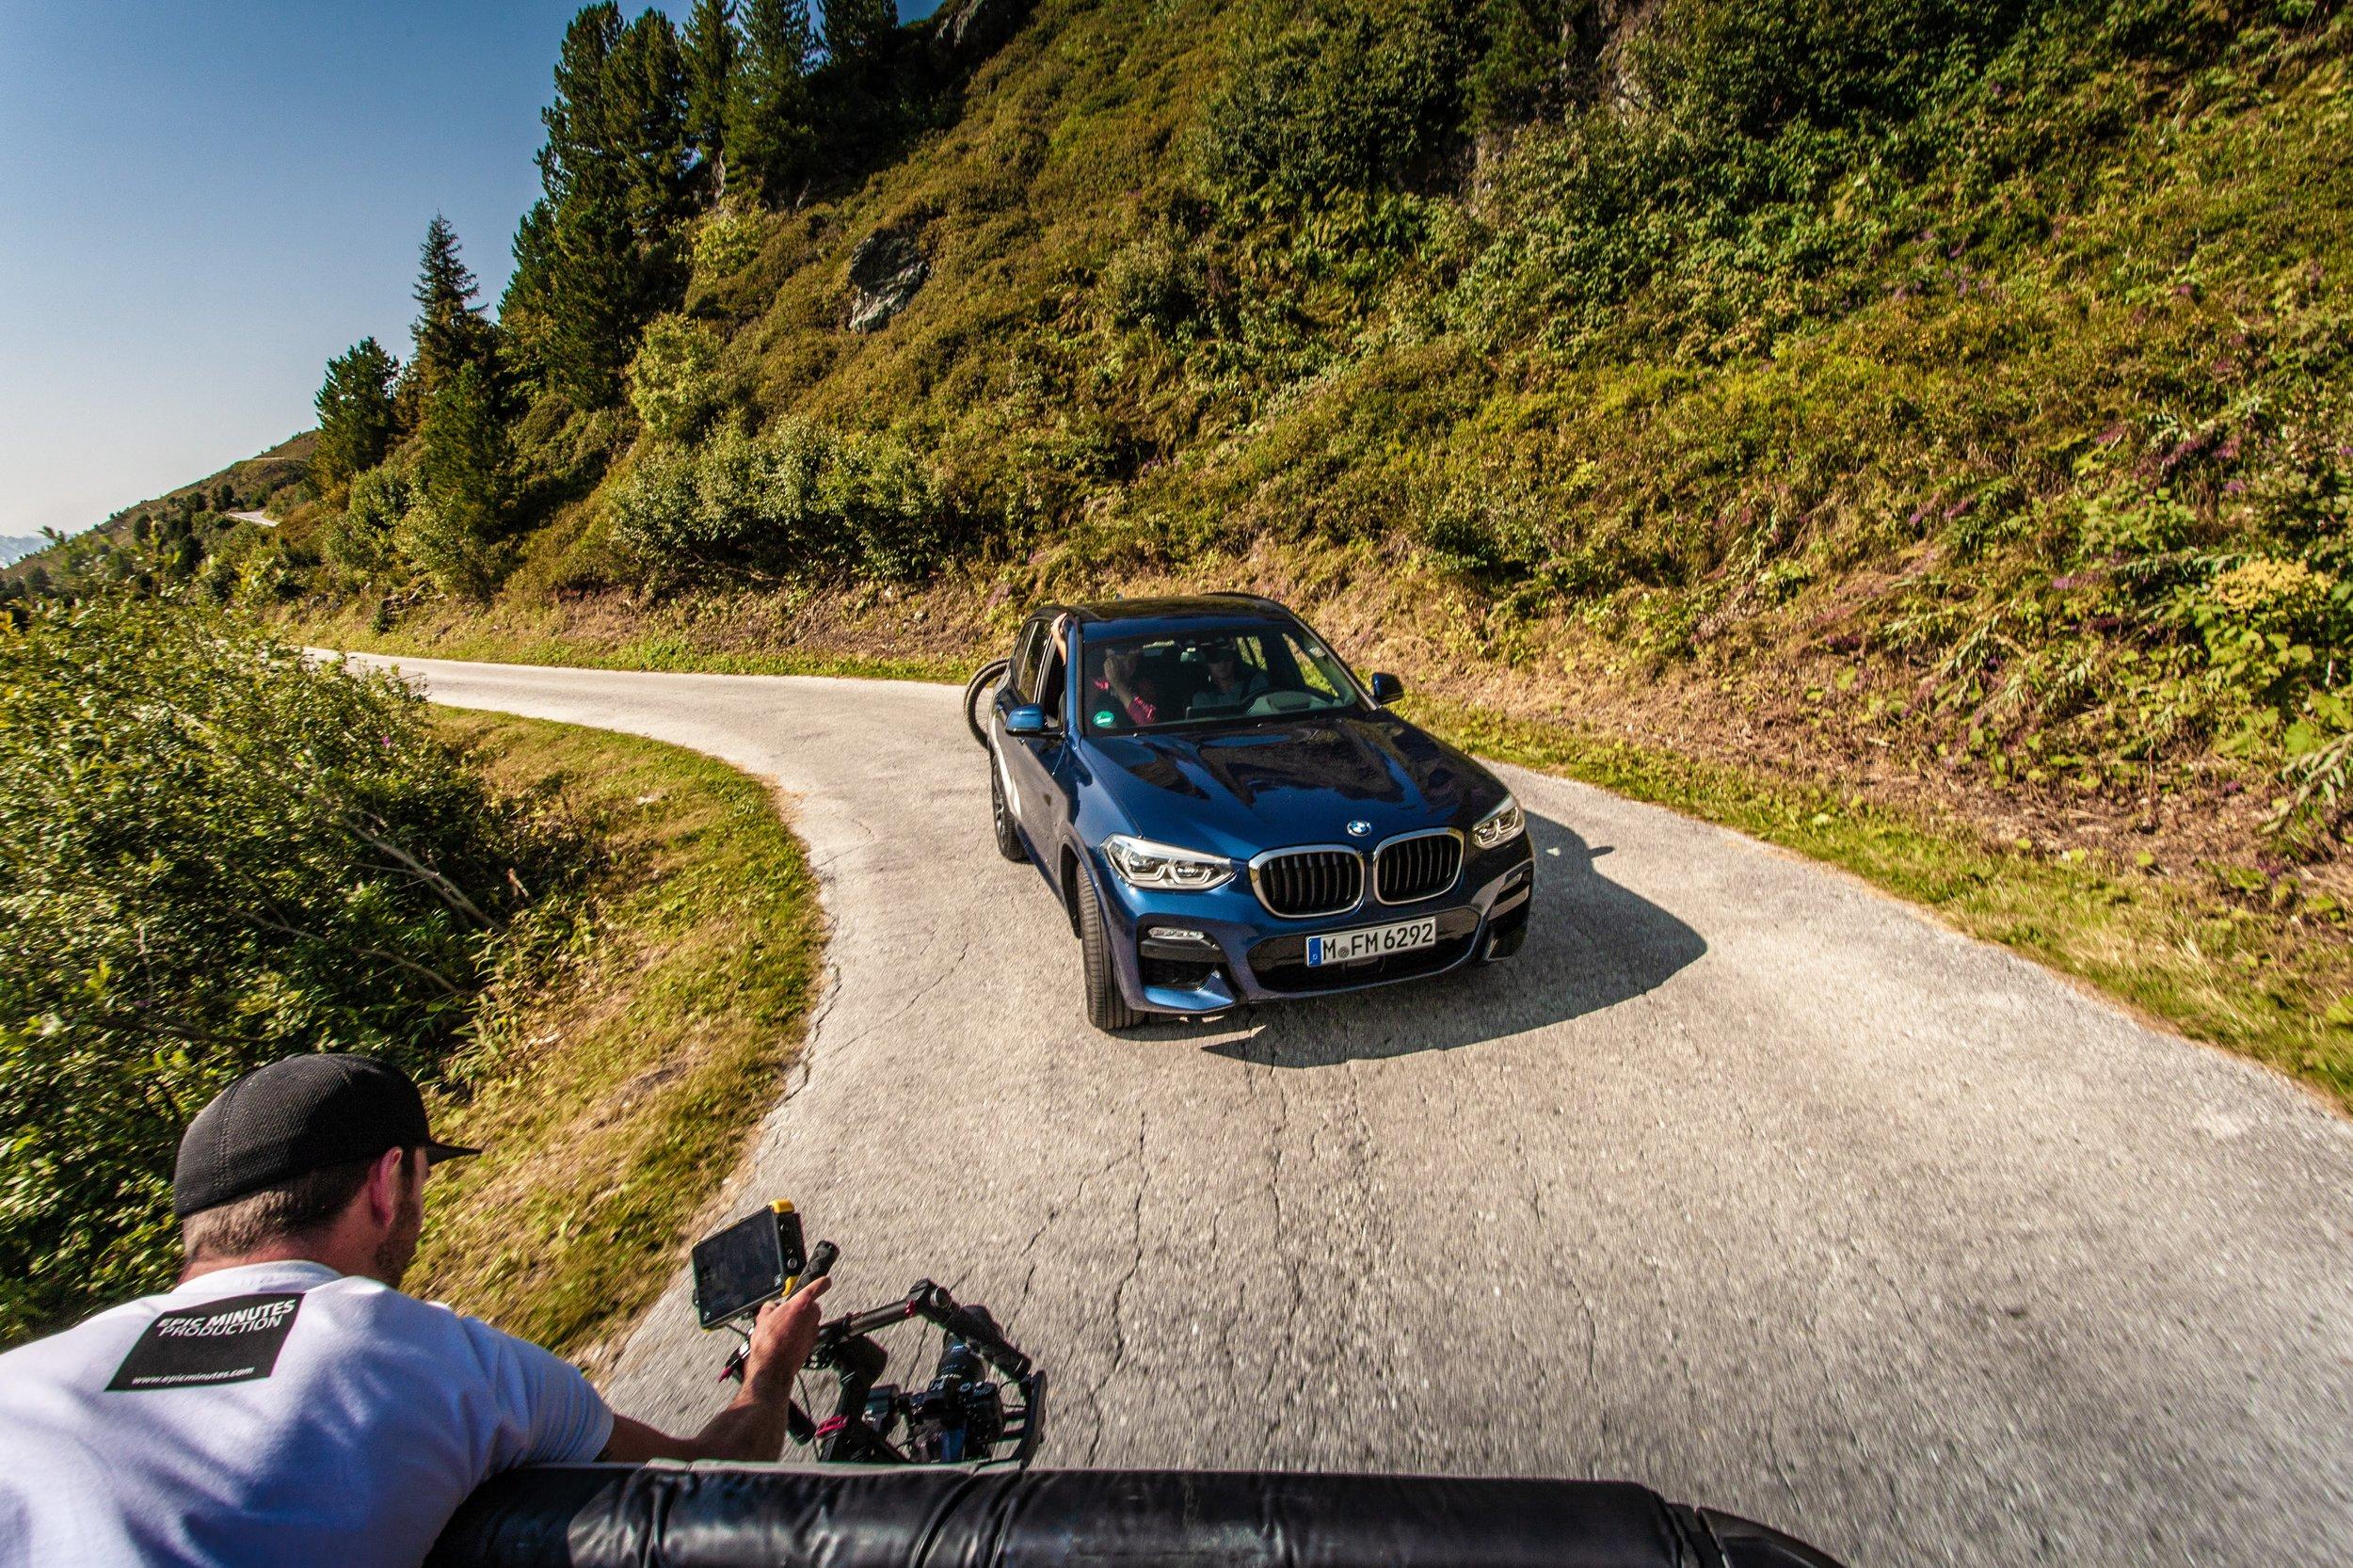 BMW_Mountains_Zillertal_2018_Day2-5534.jpg